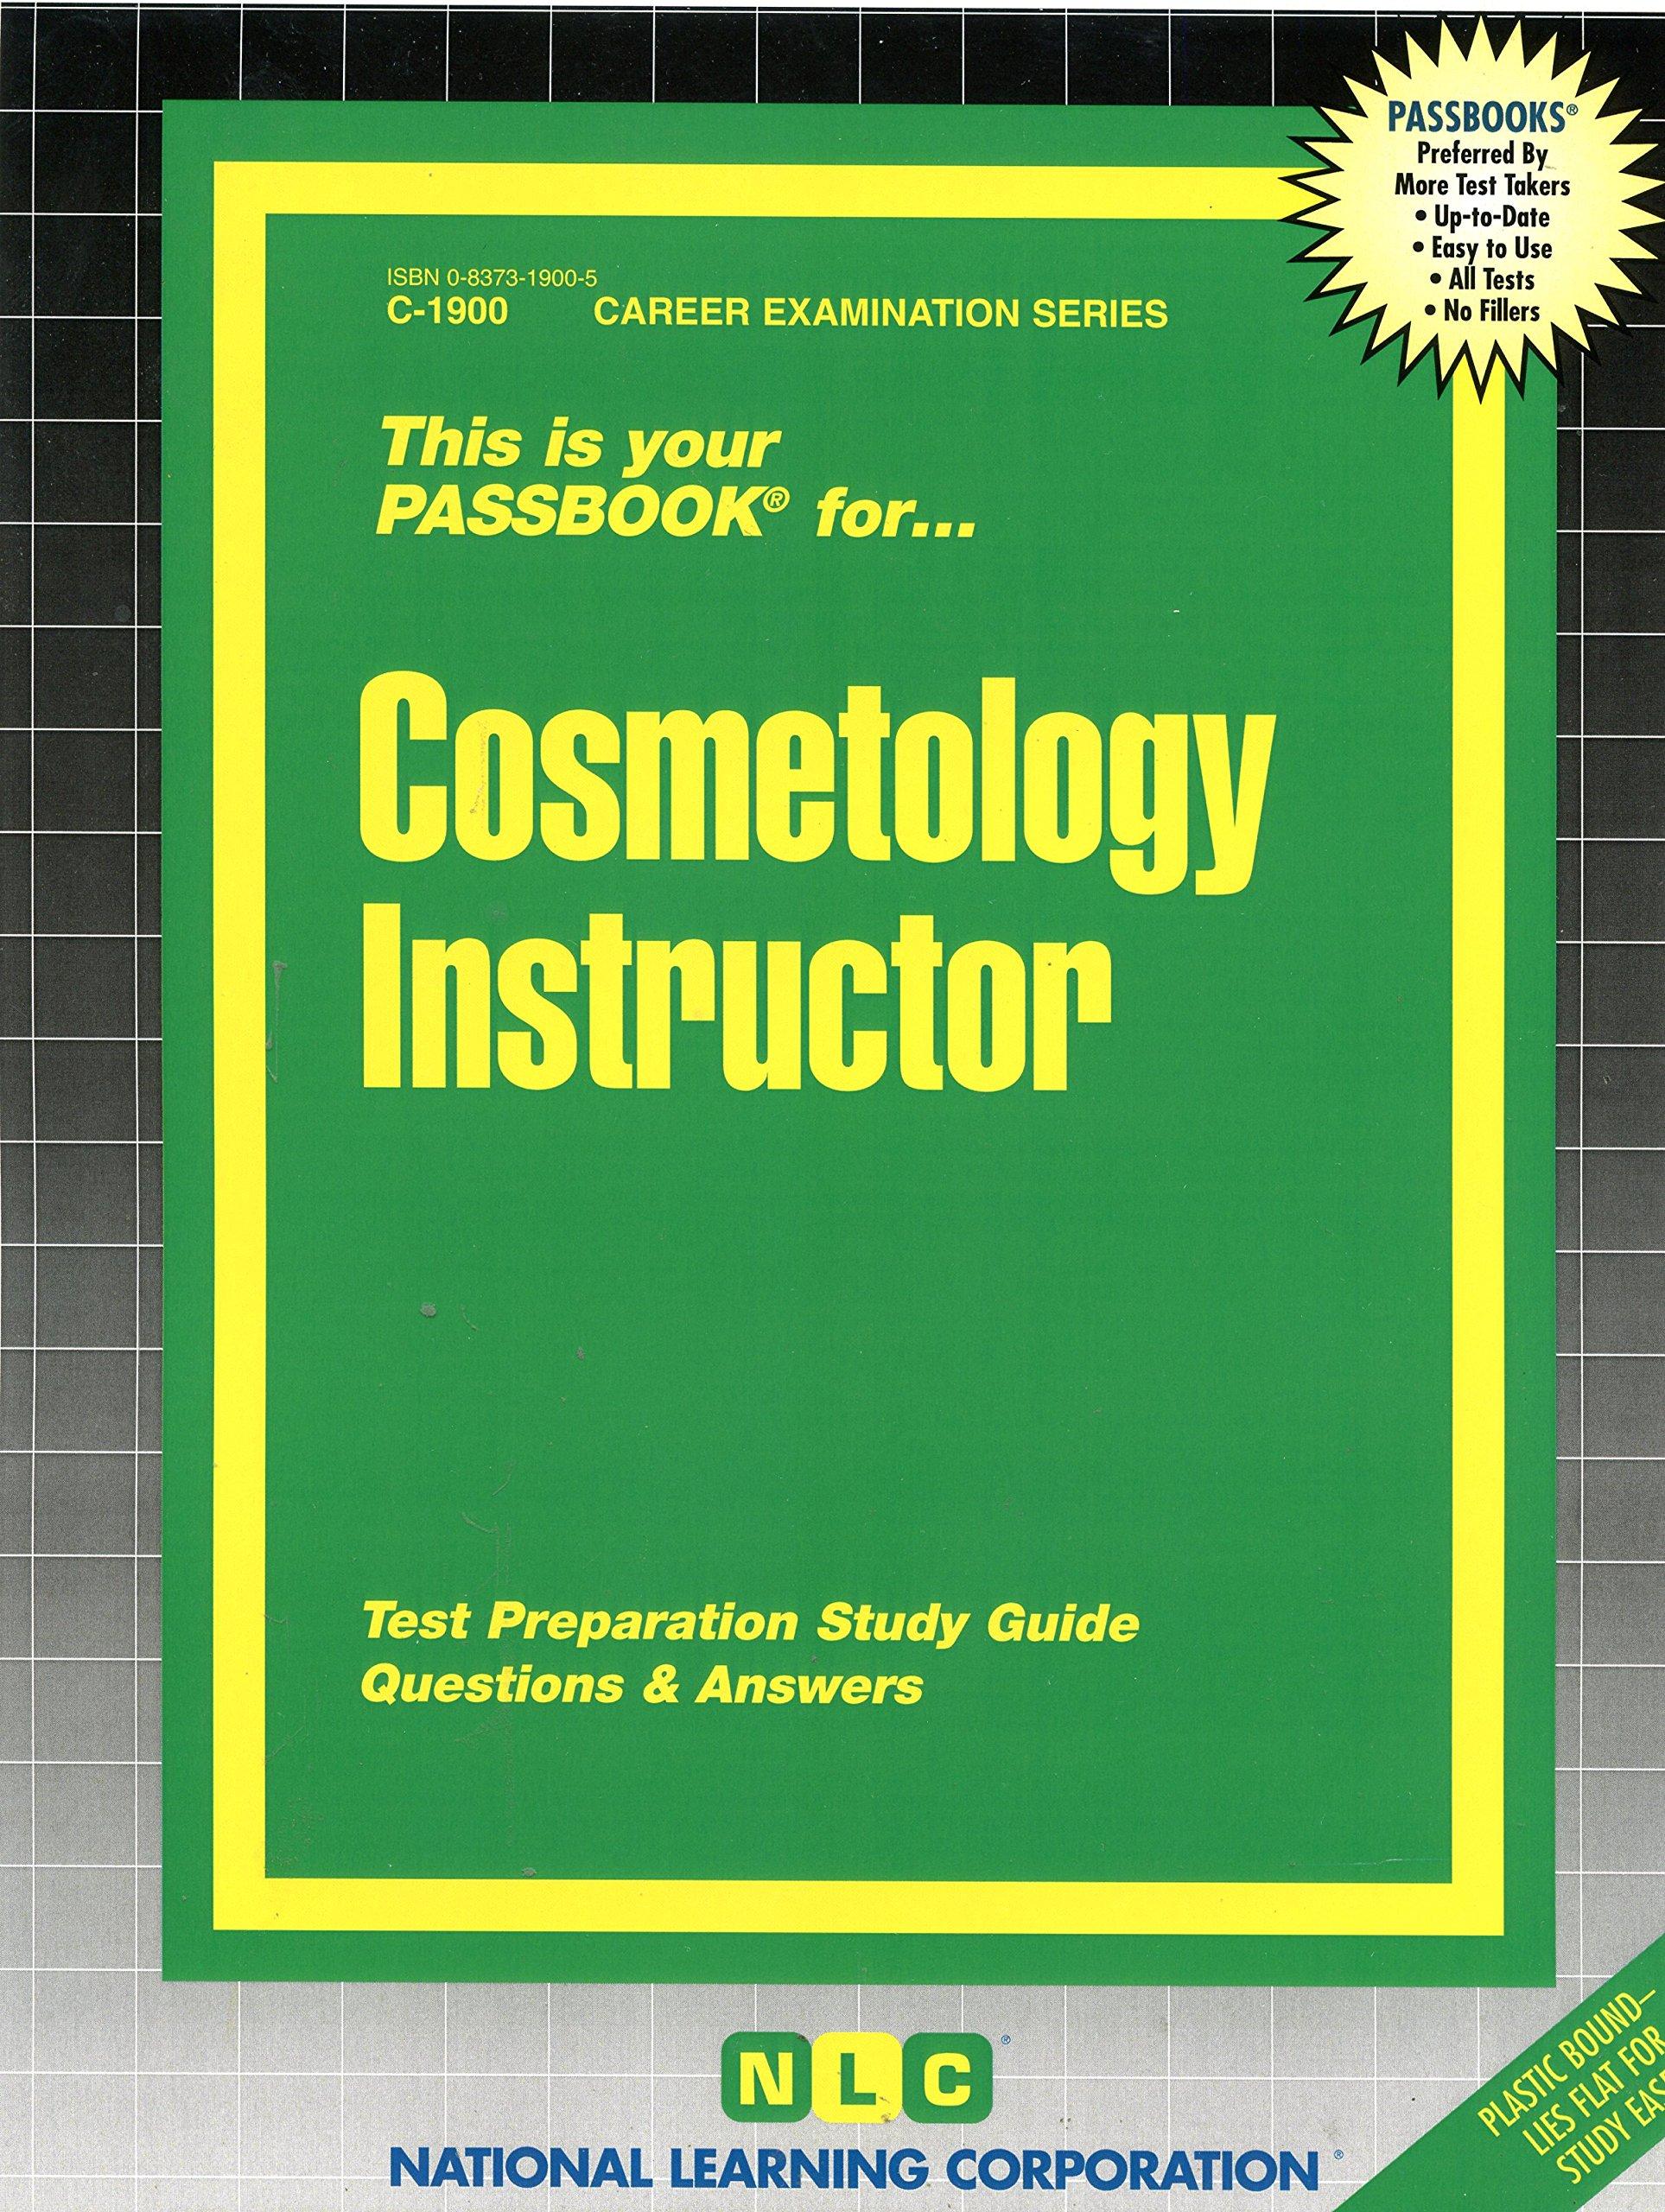 Cosmetology instructor passbooks passbooks 9780829319002 cosmetology instructor passbooks passbooks 9780829319002 amazon books fandeluxe Images